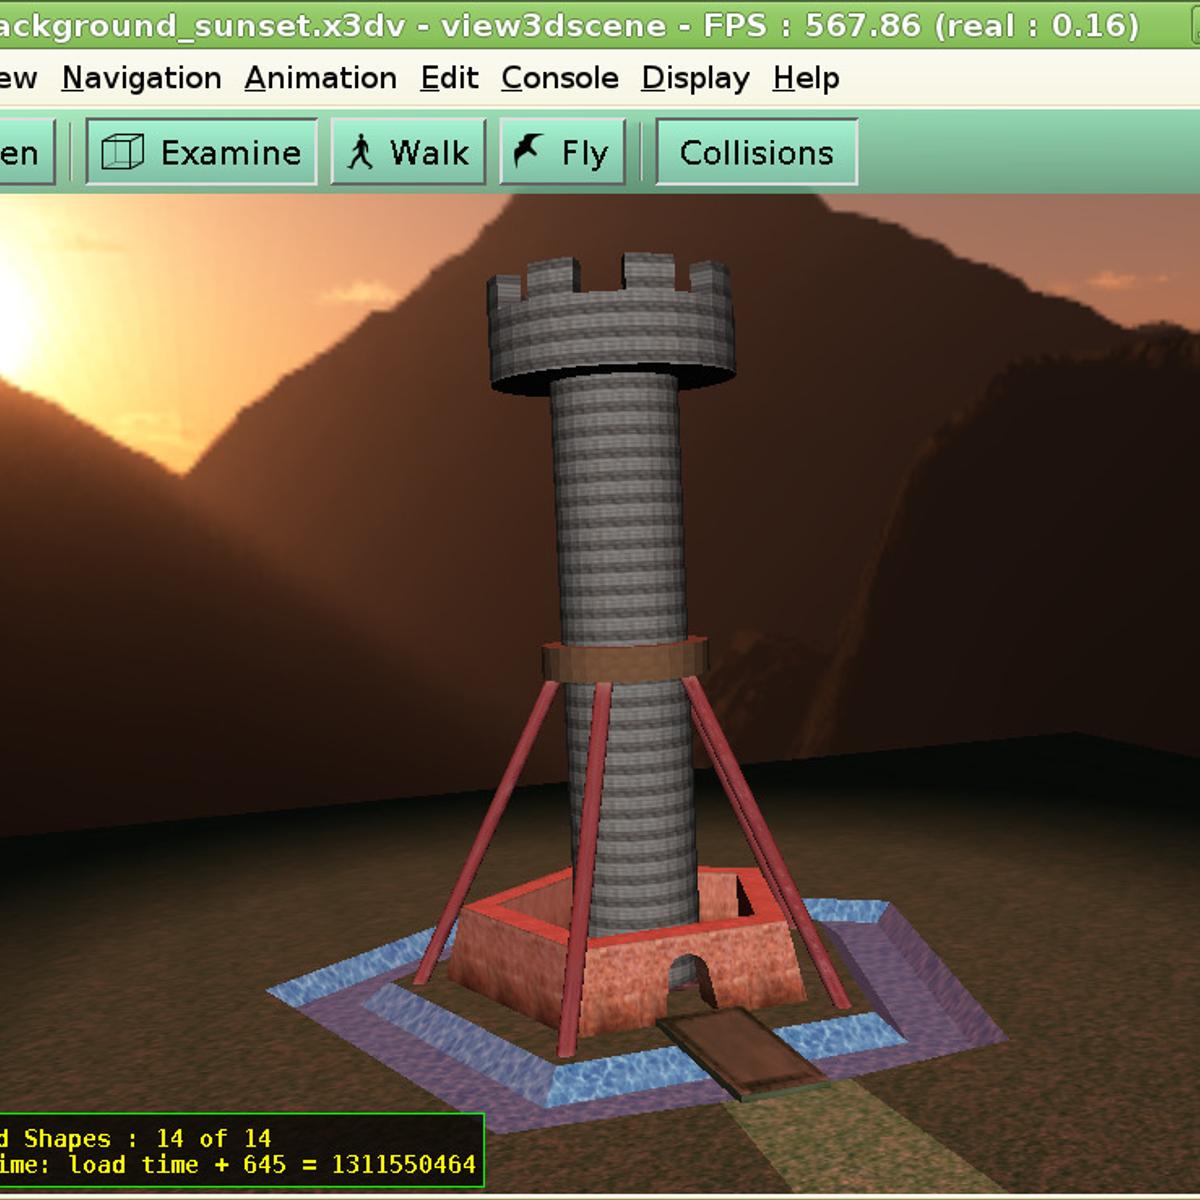 View3dscene Alternatives and Similar Software